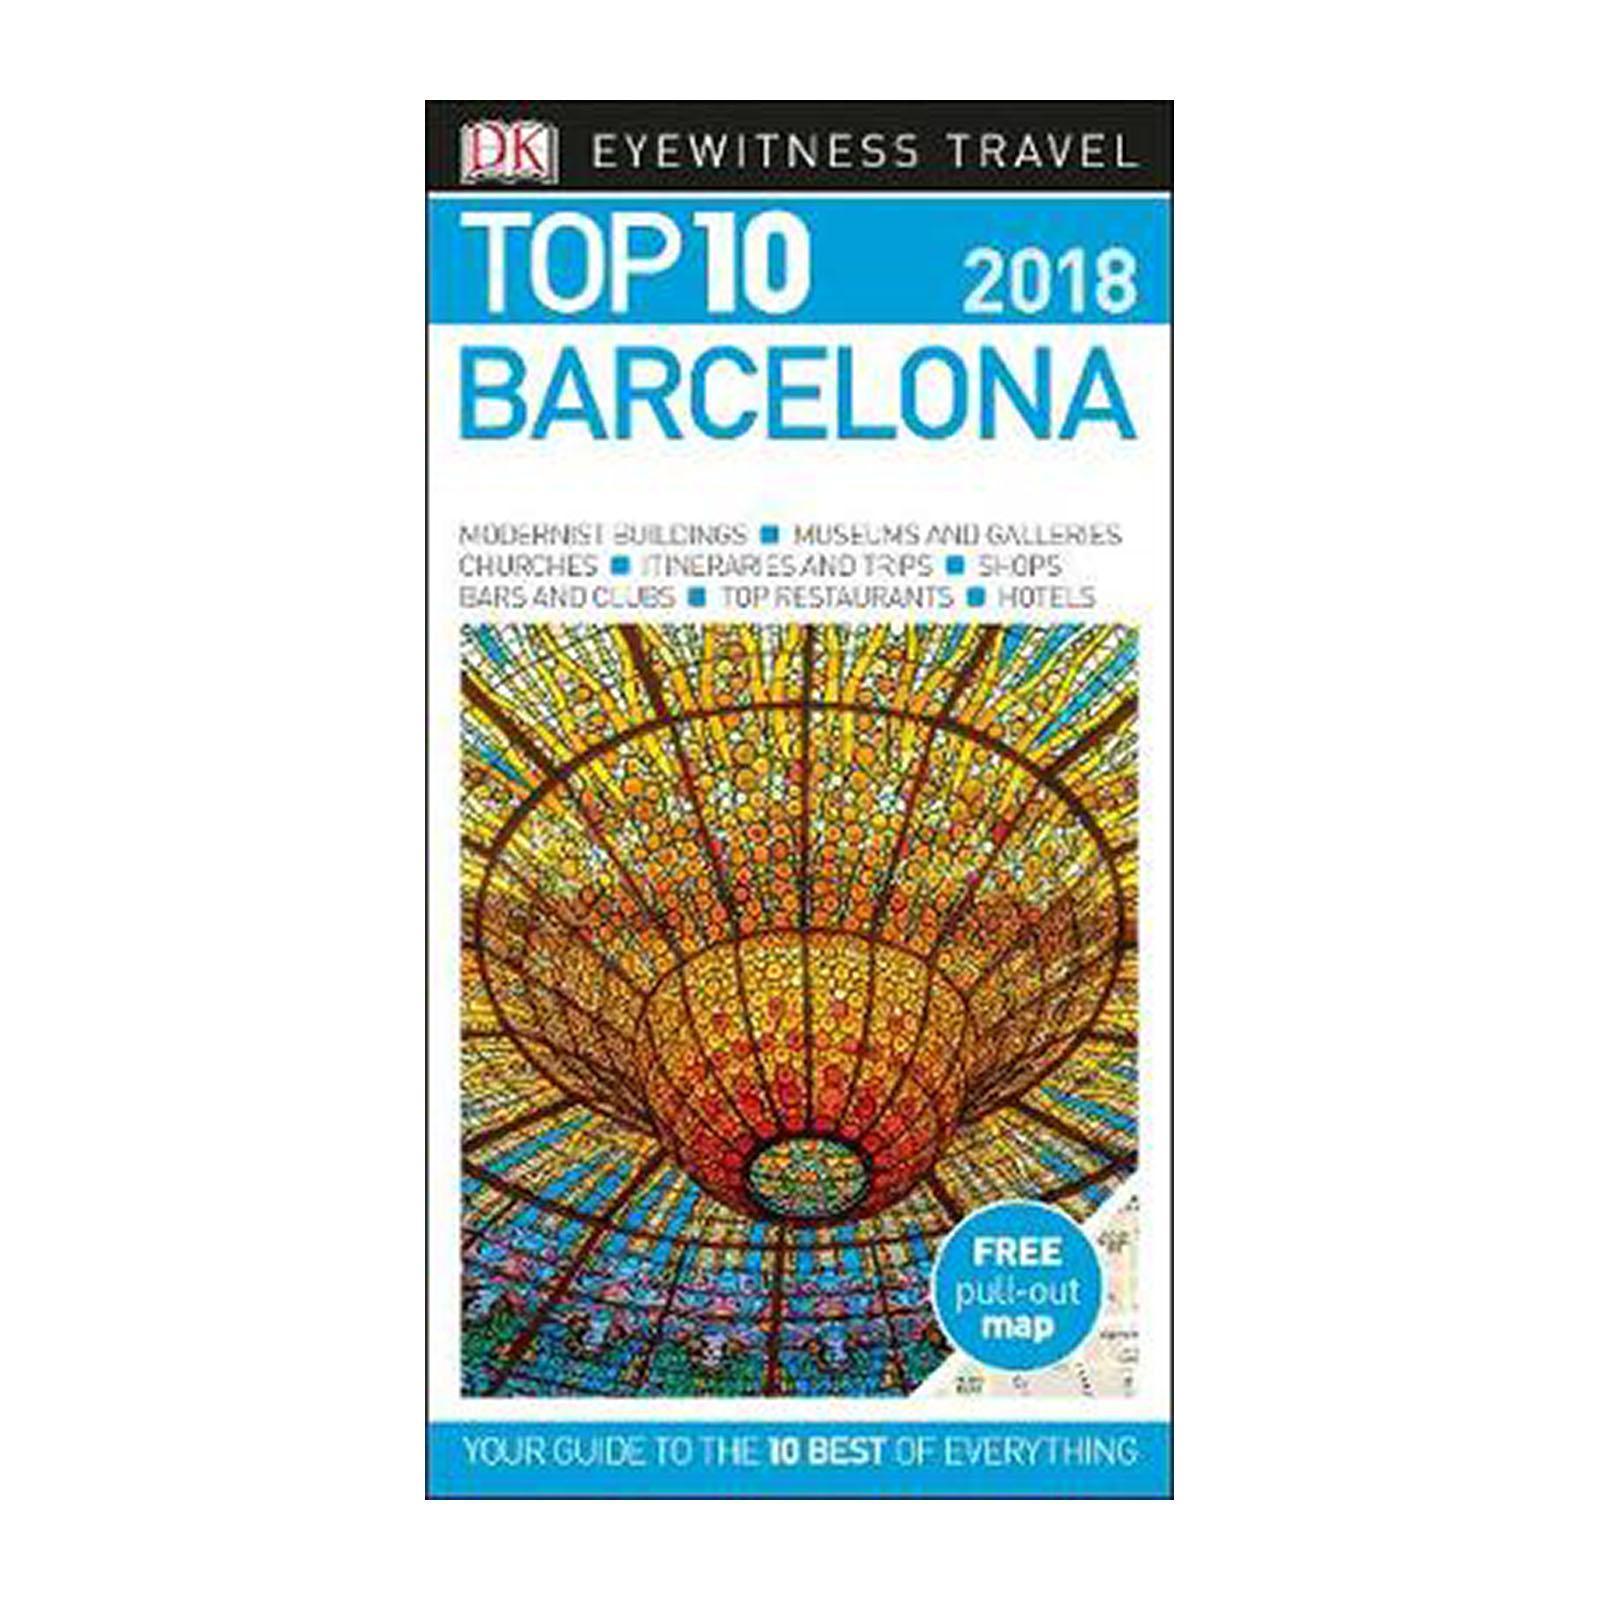 Top 10 Barcelona: 2018 (Paperback)